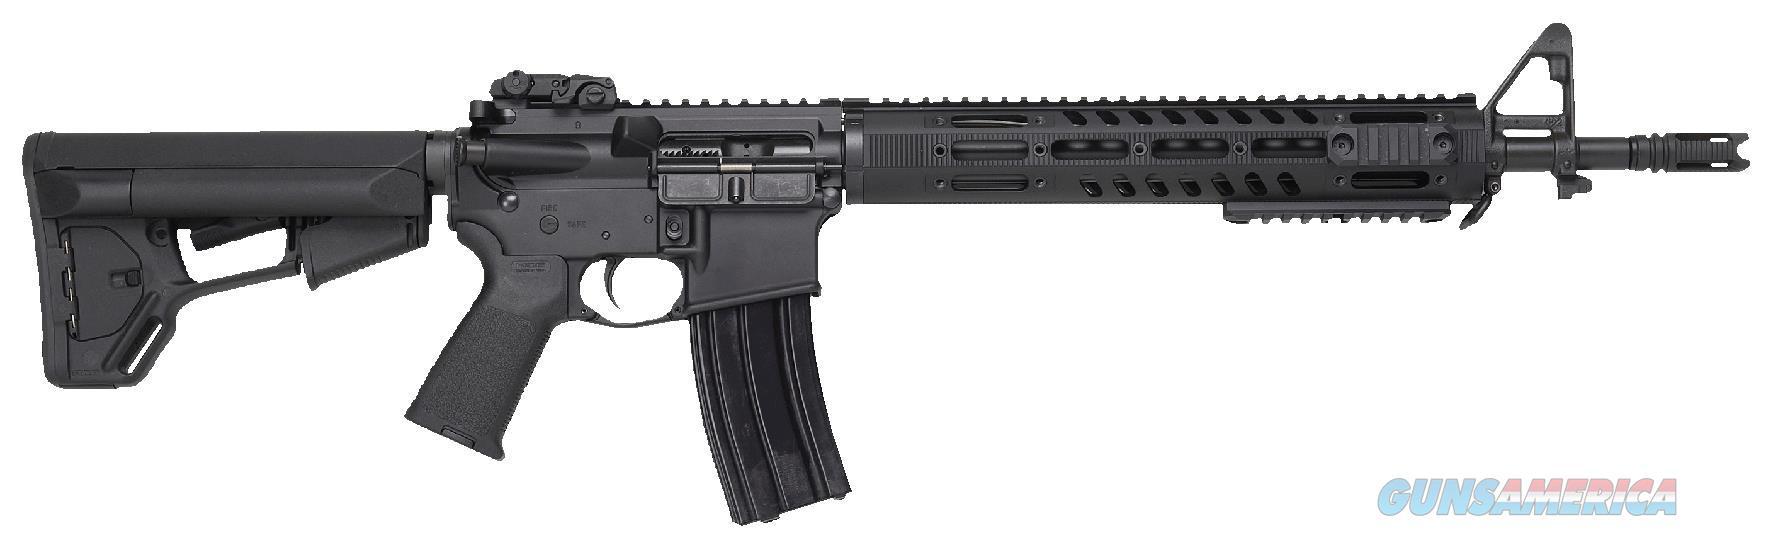 "Dpms 60545 Tac2 Enhanced Tactical Semi-Automatic 223 Remington/5.56 Nato 16"" 30+1 Magpul Acs Black Stock Black 60545  Guns > Rifles > D Misc Rifles"